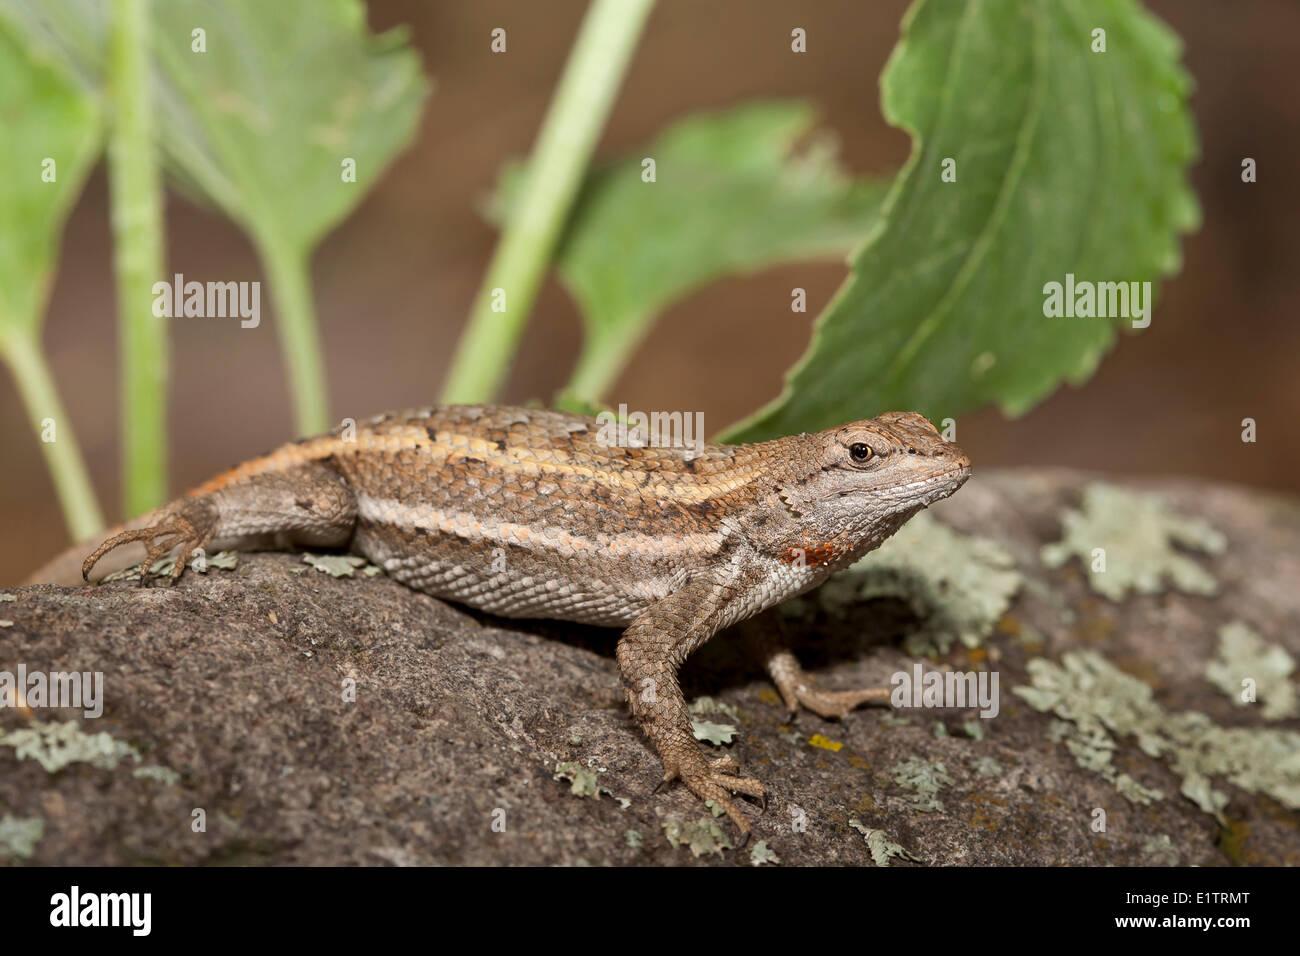 Striped Plateau Lizard, Sceloporus virgatus, Arizona, USA Stock Photo